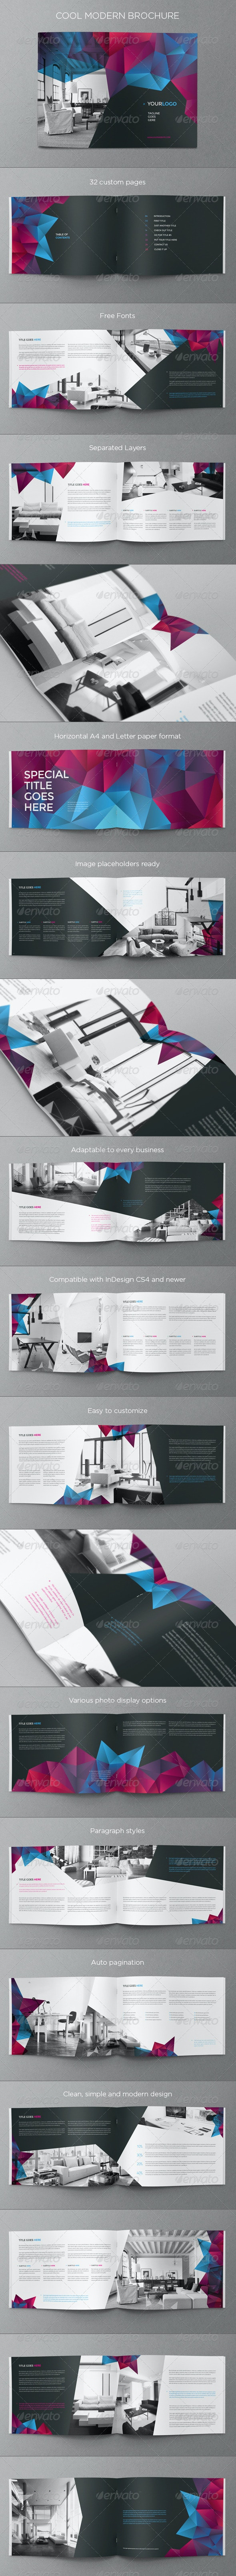 Cool Modern Brochure - Brochures Print Templates